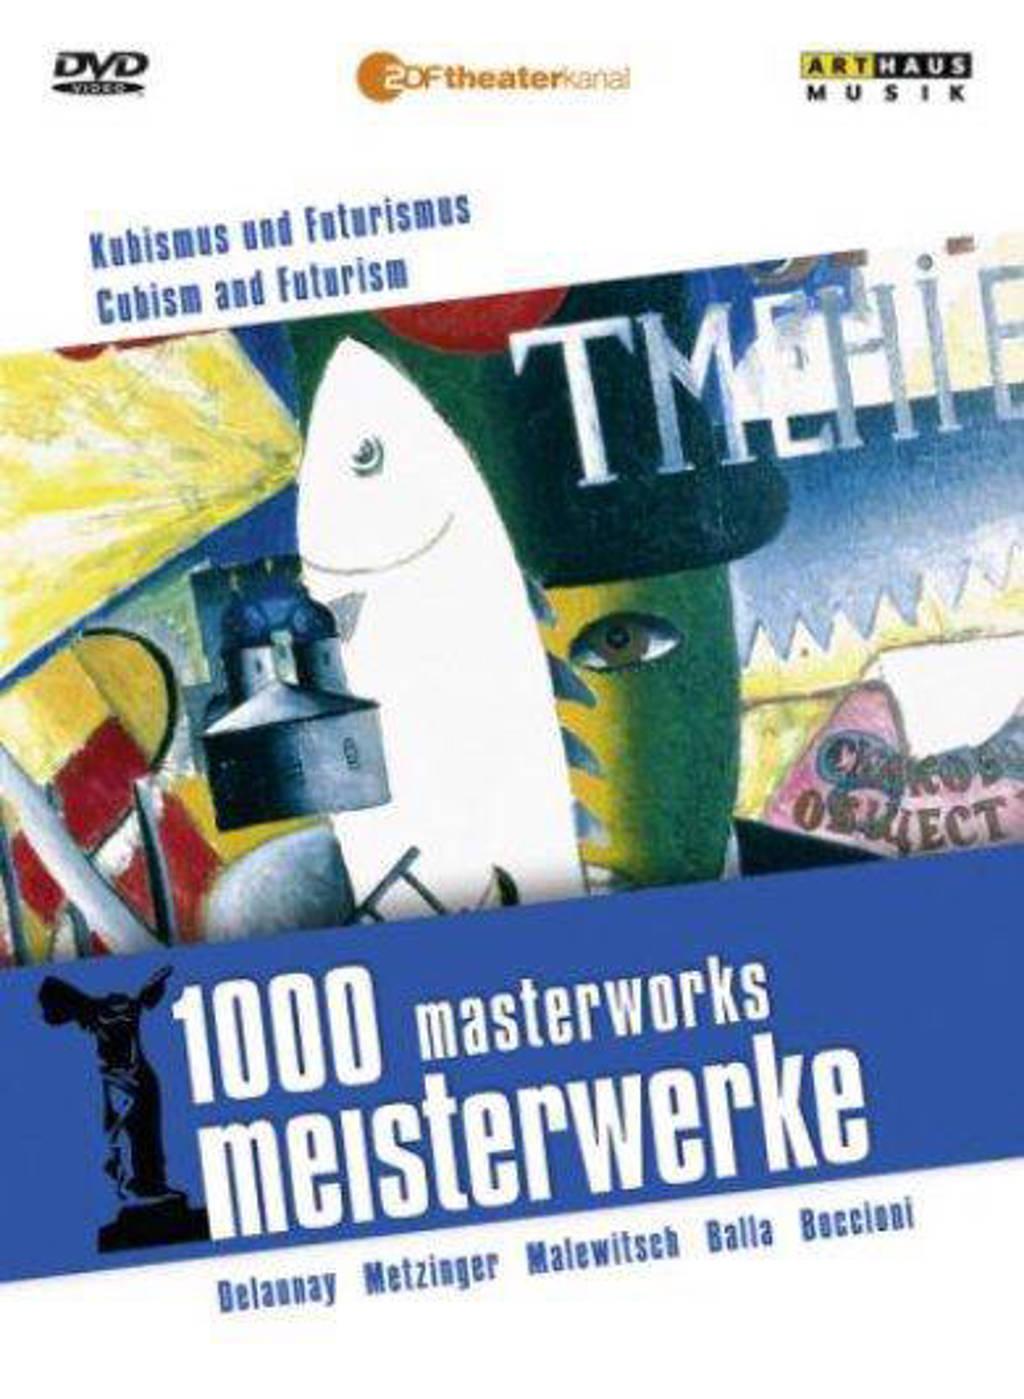 Delauny , Metzinger, Balla,Malewitc - 1000 Masterworks Cubism & Futurism (DVD)